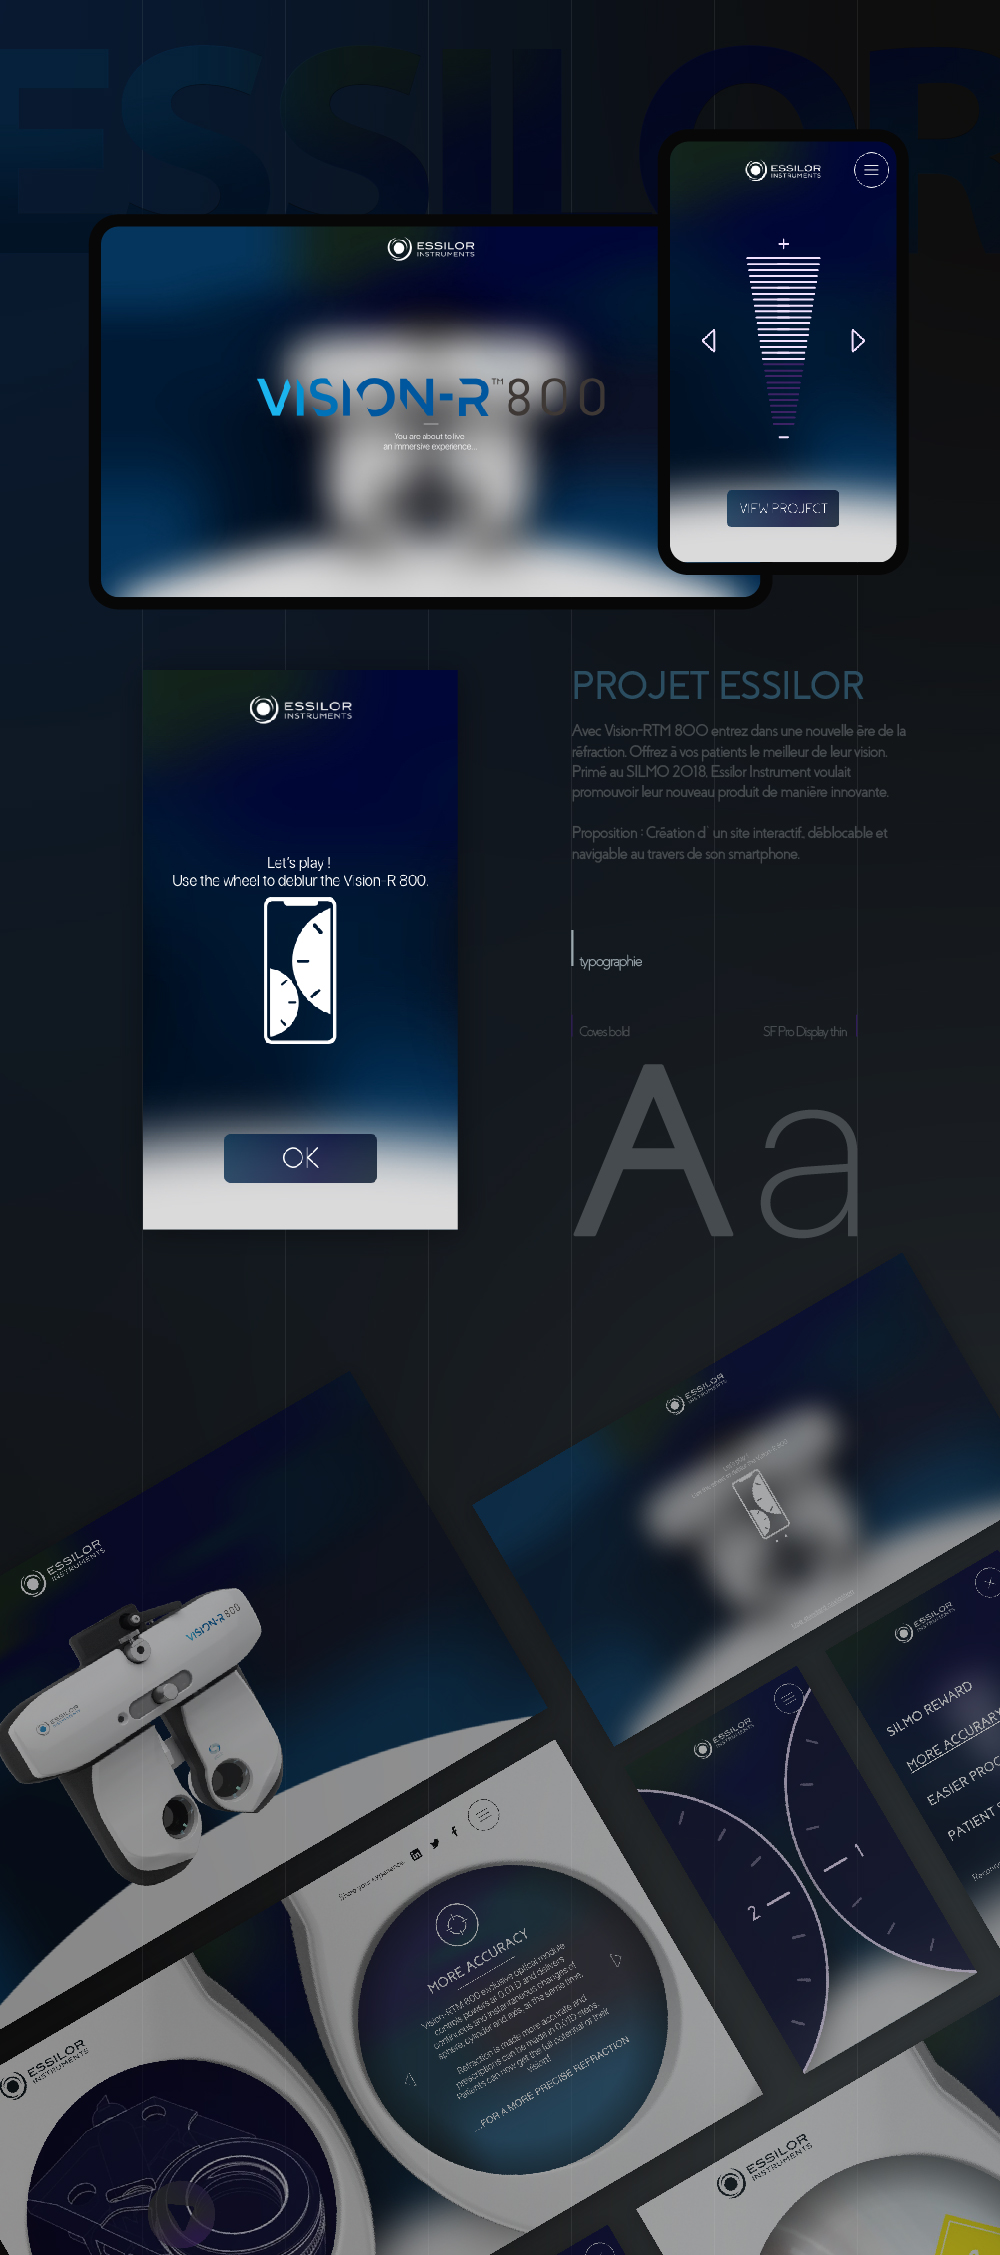 Projet Essilor_Plan de travail 1.jpg